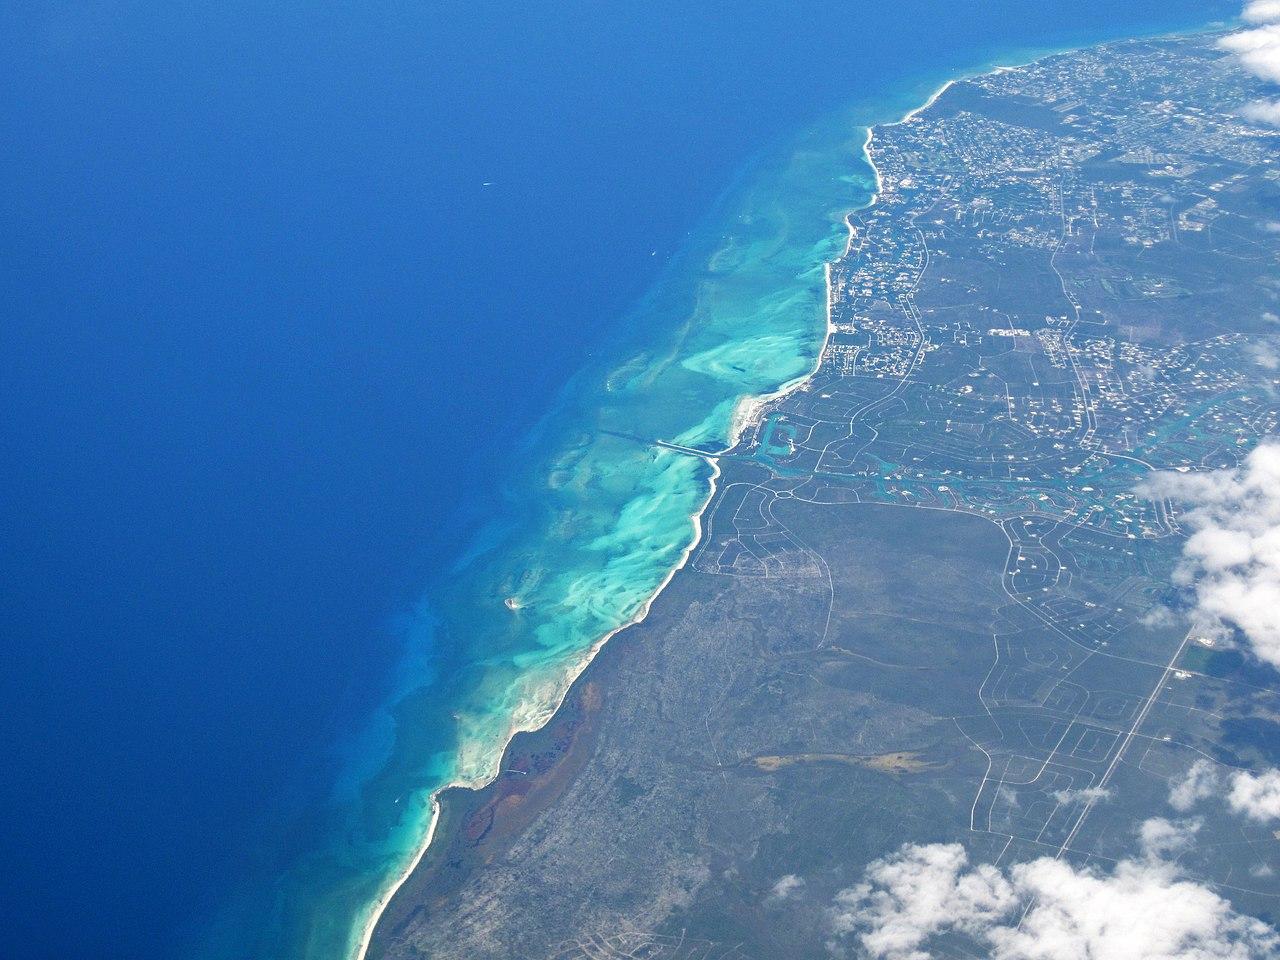 Insula Grand Bahama